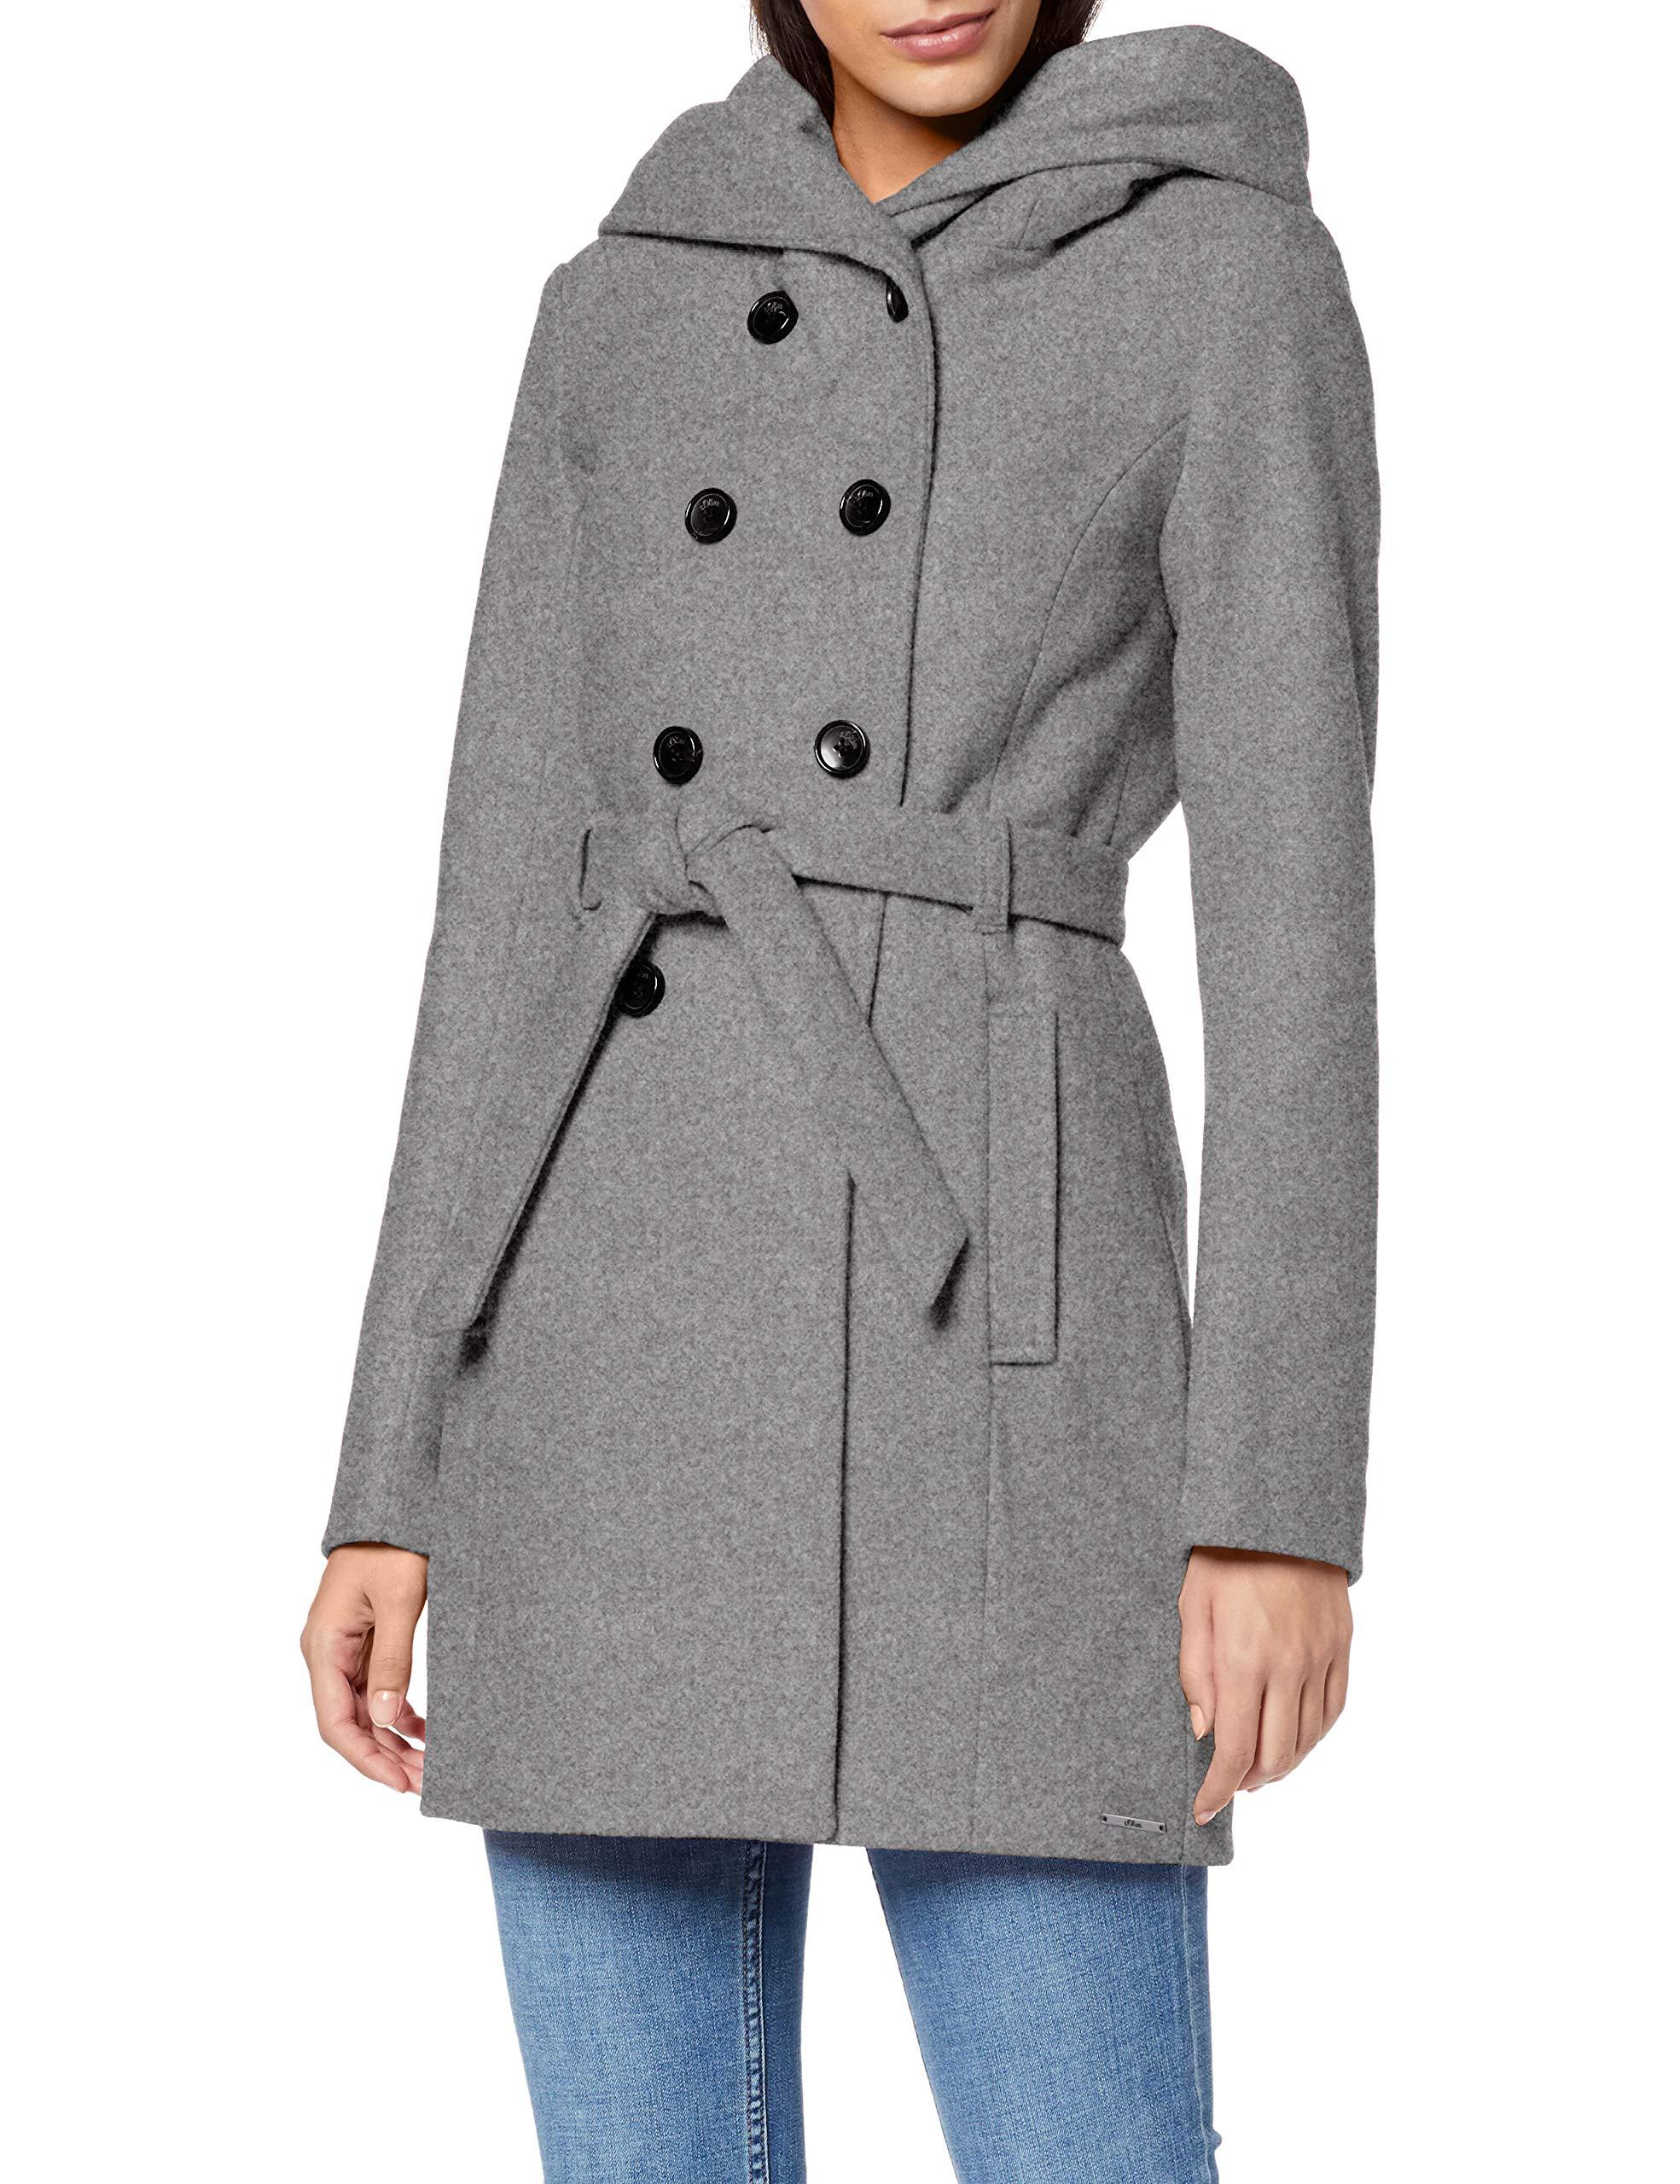 Wool Melange Hechter Damen Mantel Grau Daniel Coat Grey shQdCxBtr